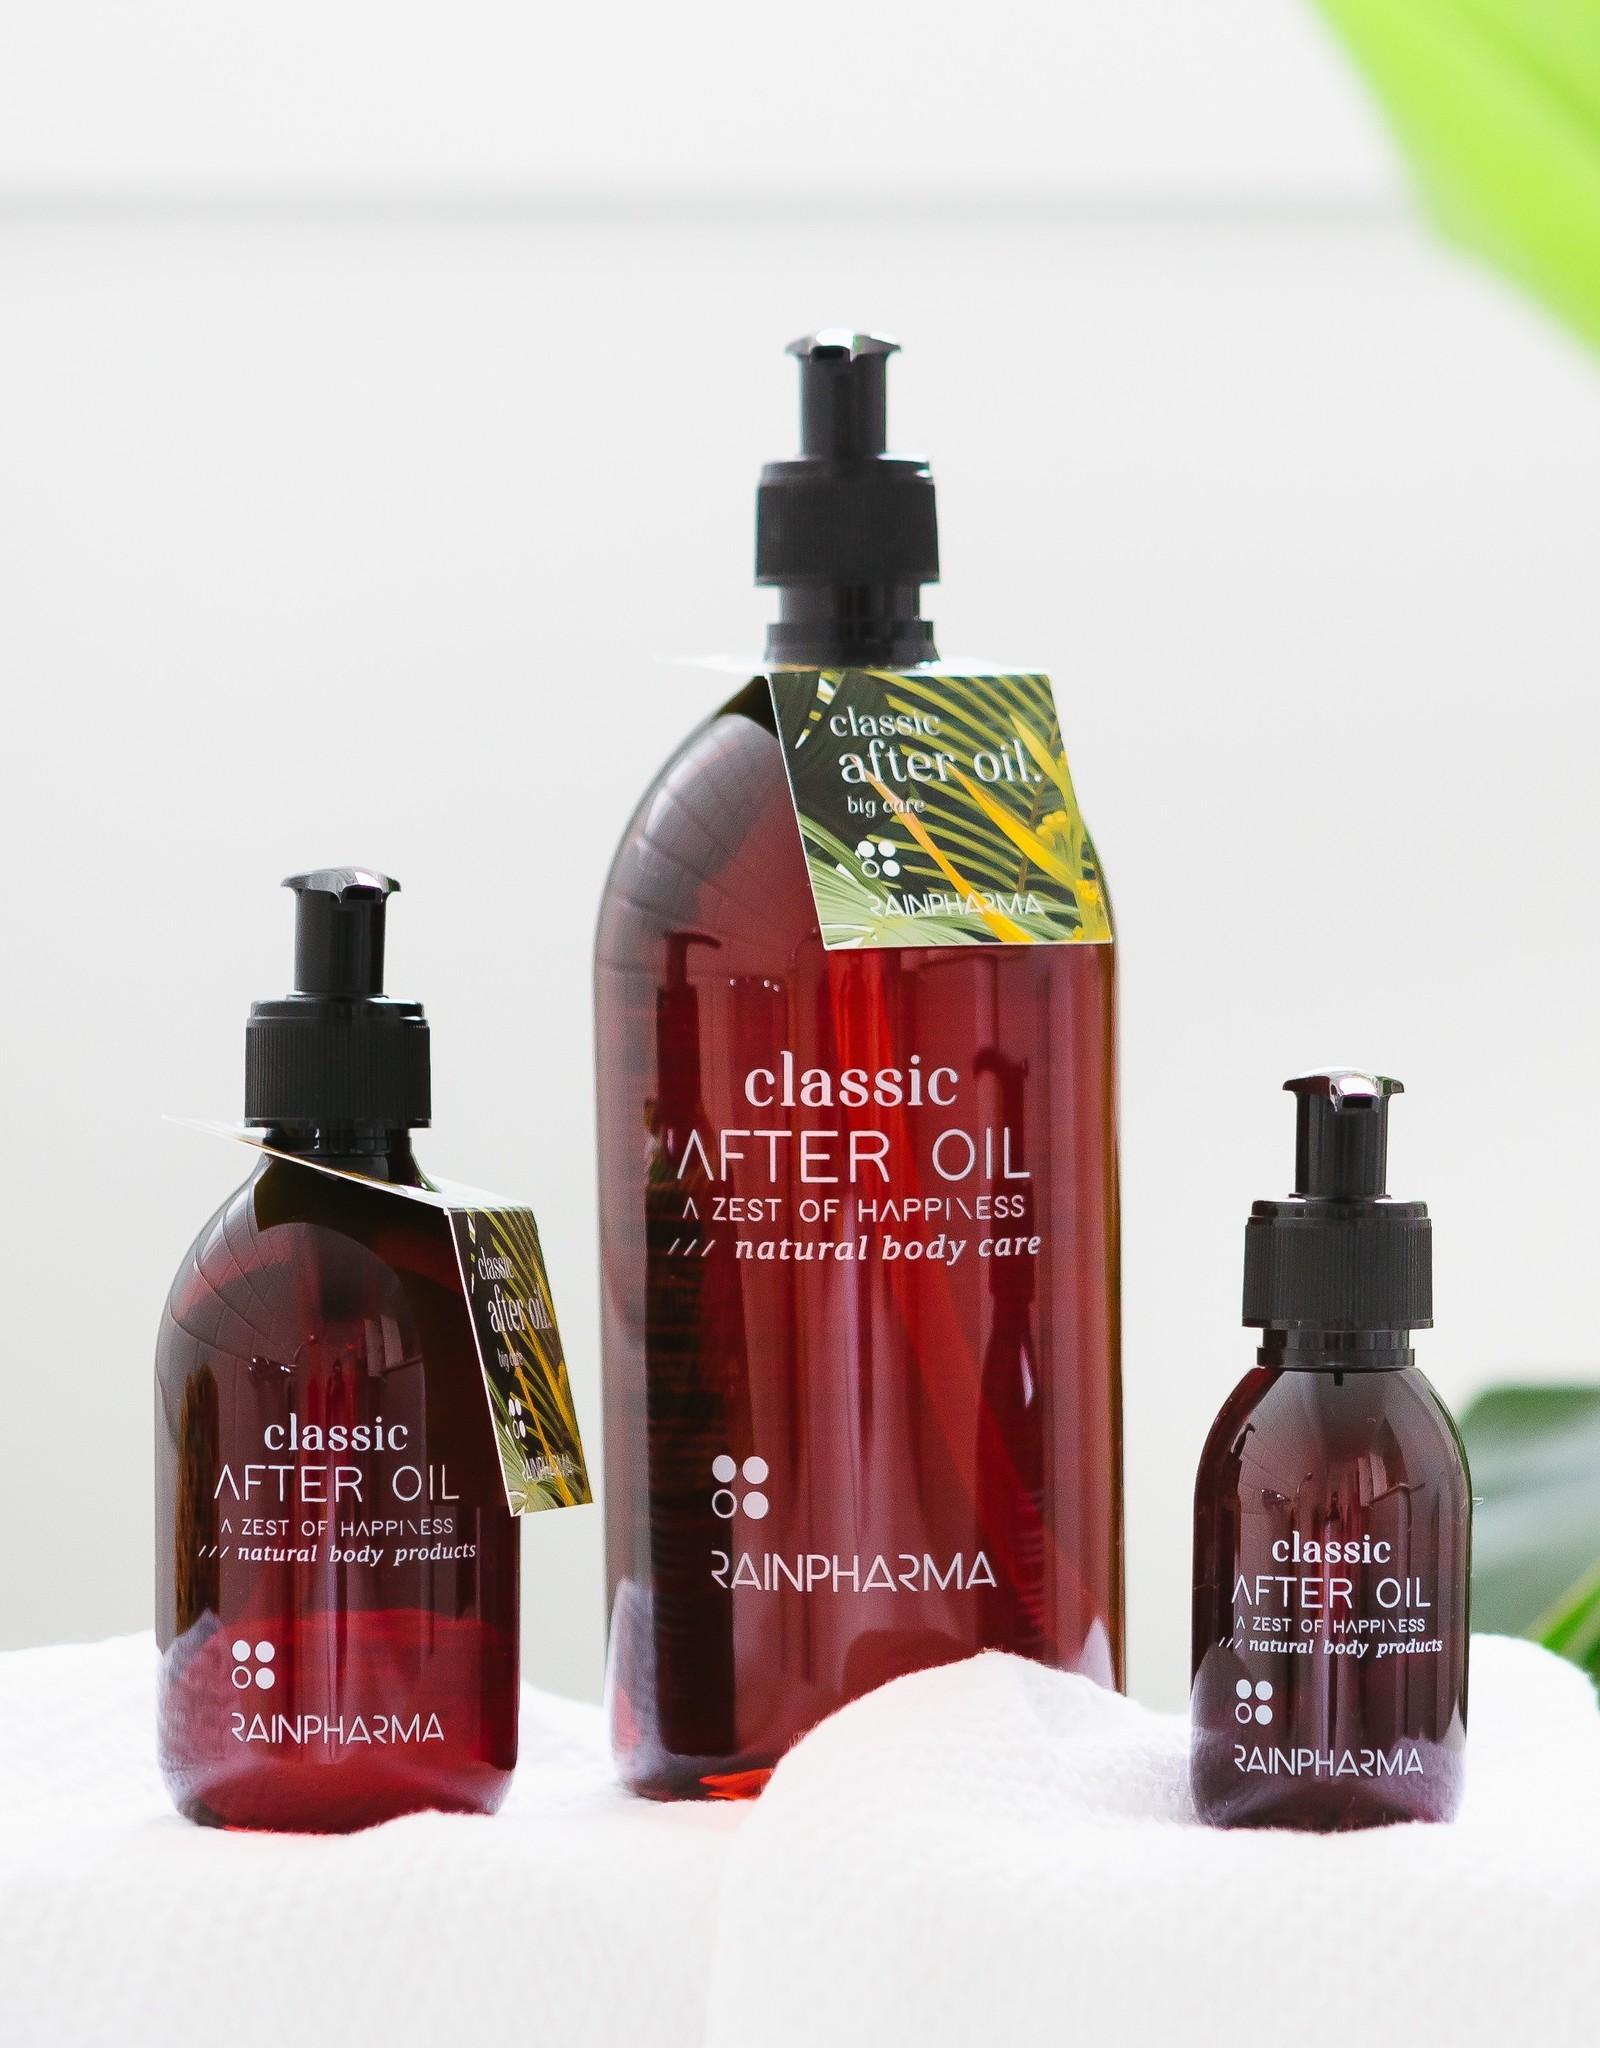 RainPharma Classic After Oil 500 ml - Rainpharma